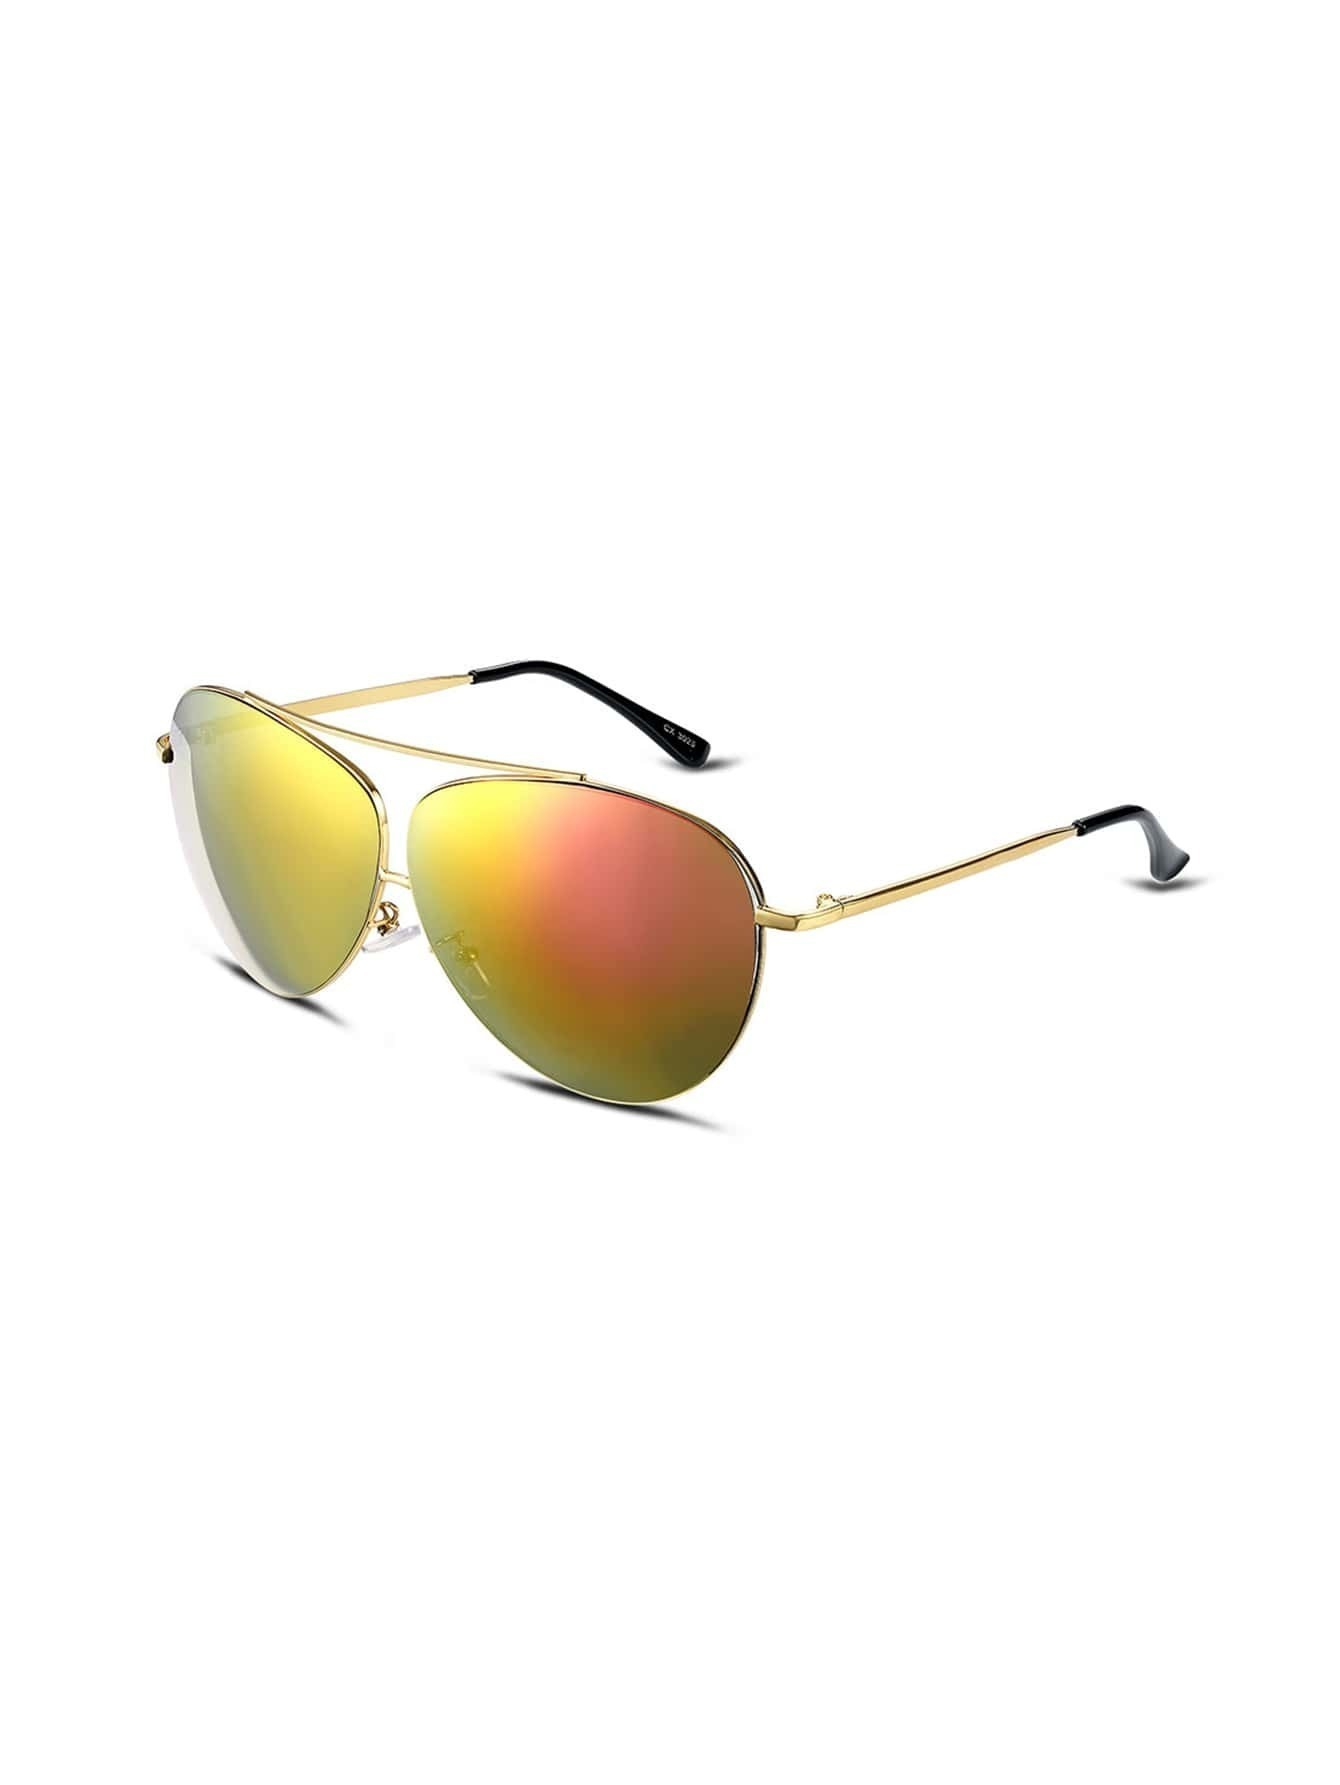 Gold Frame Mirrored Aviator Sunglasses : Gold Frame Double Bridge Mirrored Aviator Sunglasses